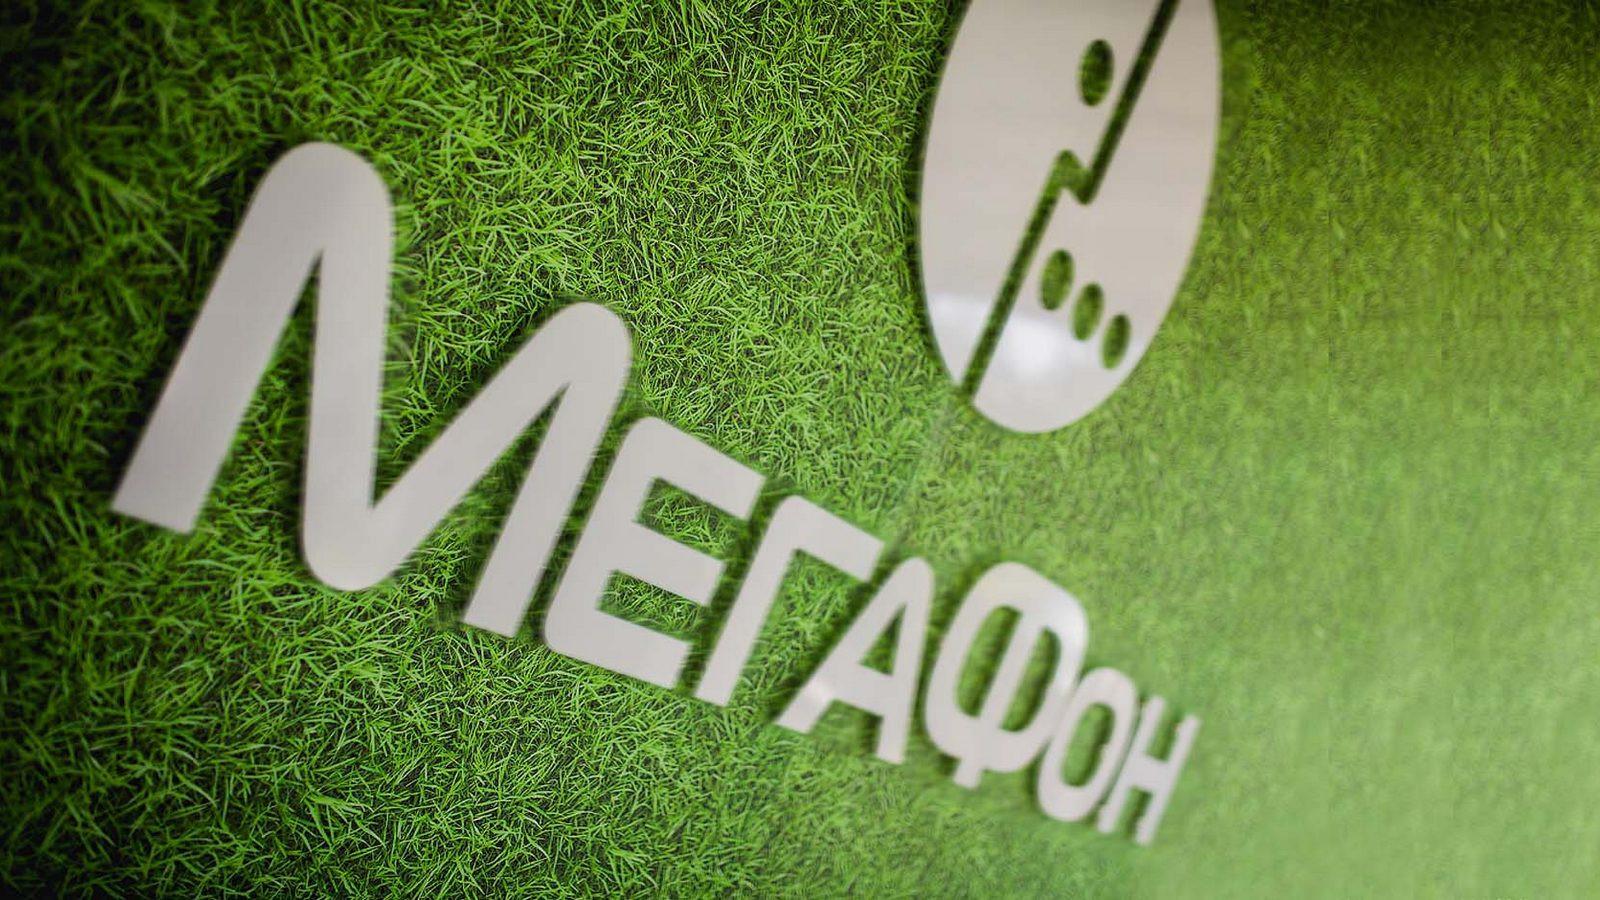 «Мегафон» тестирует технологию для увеличения скорости интернета на телефонах